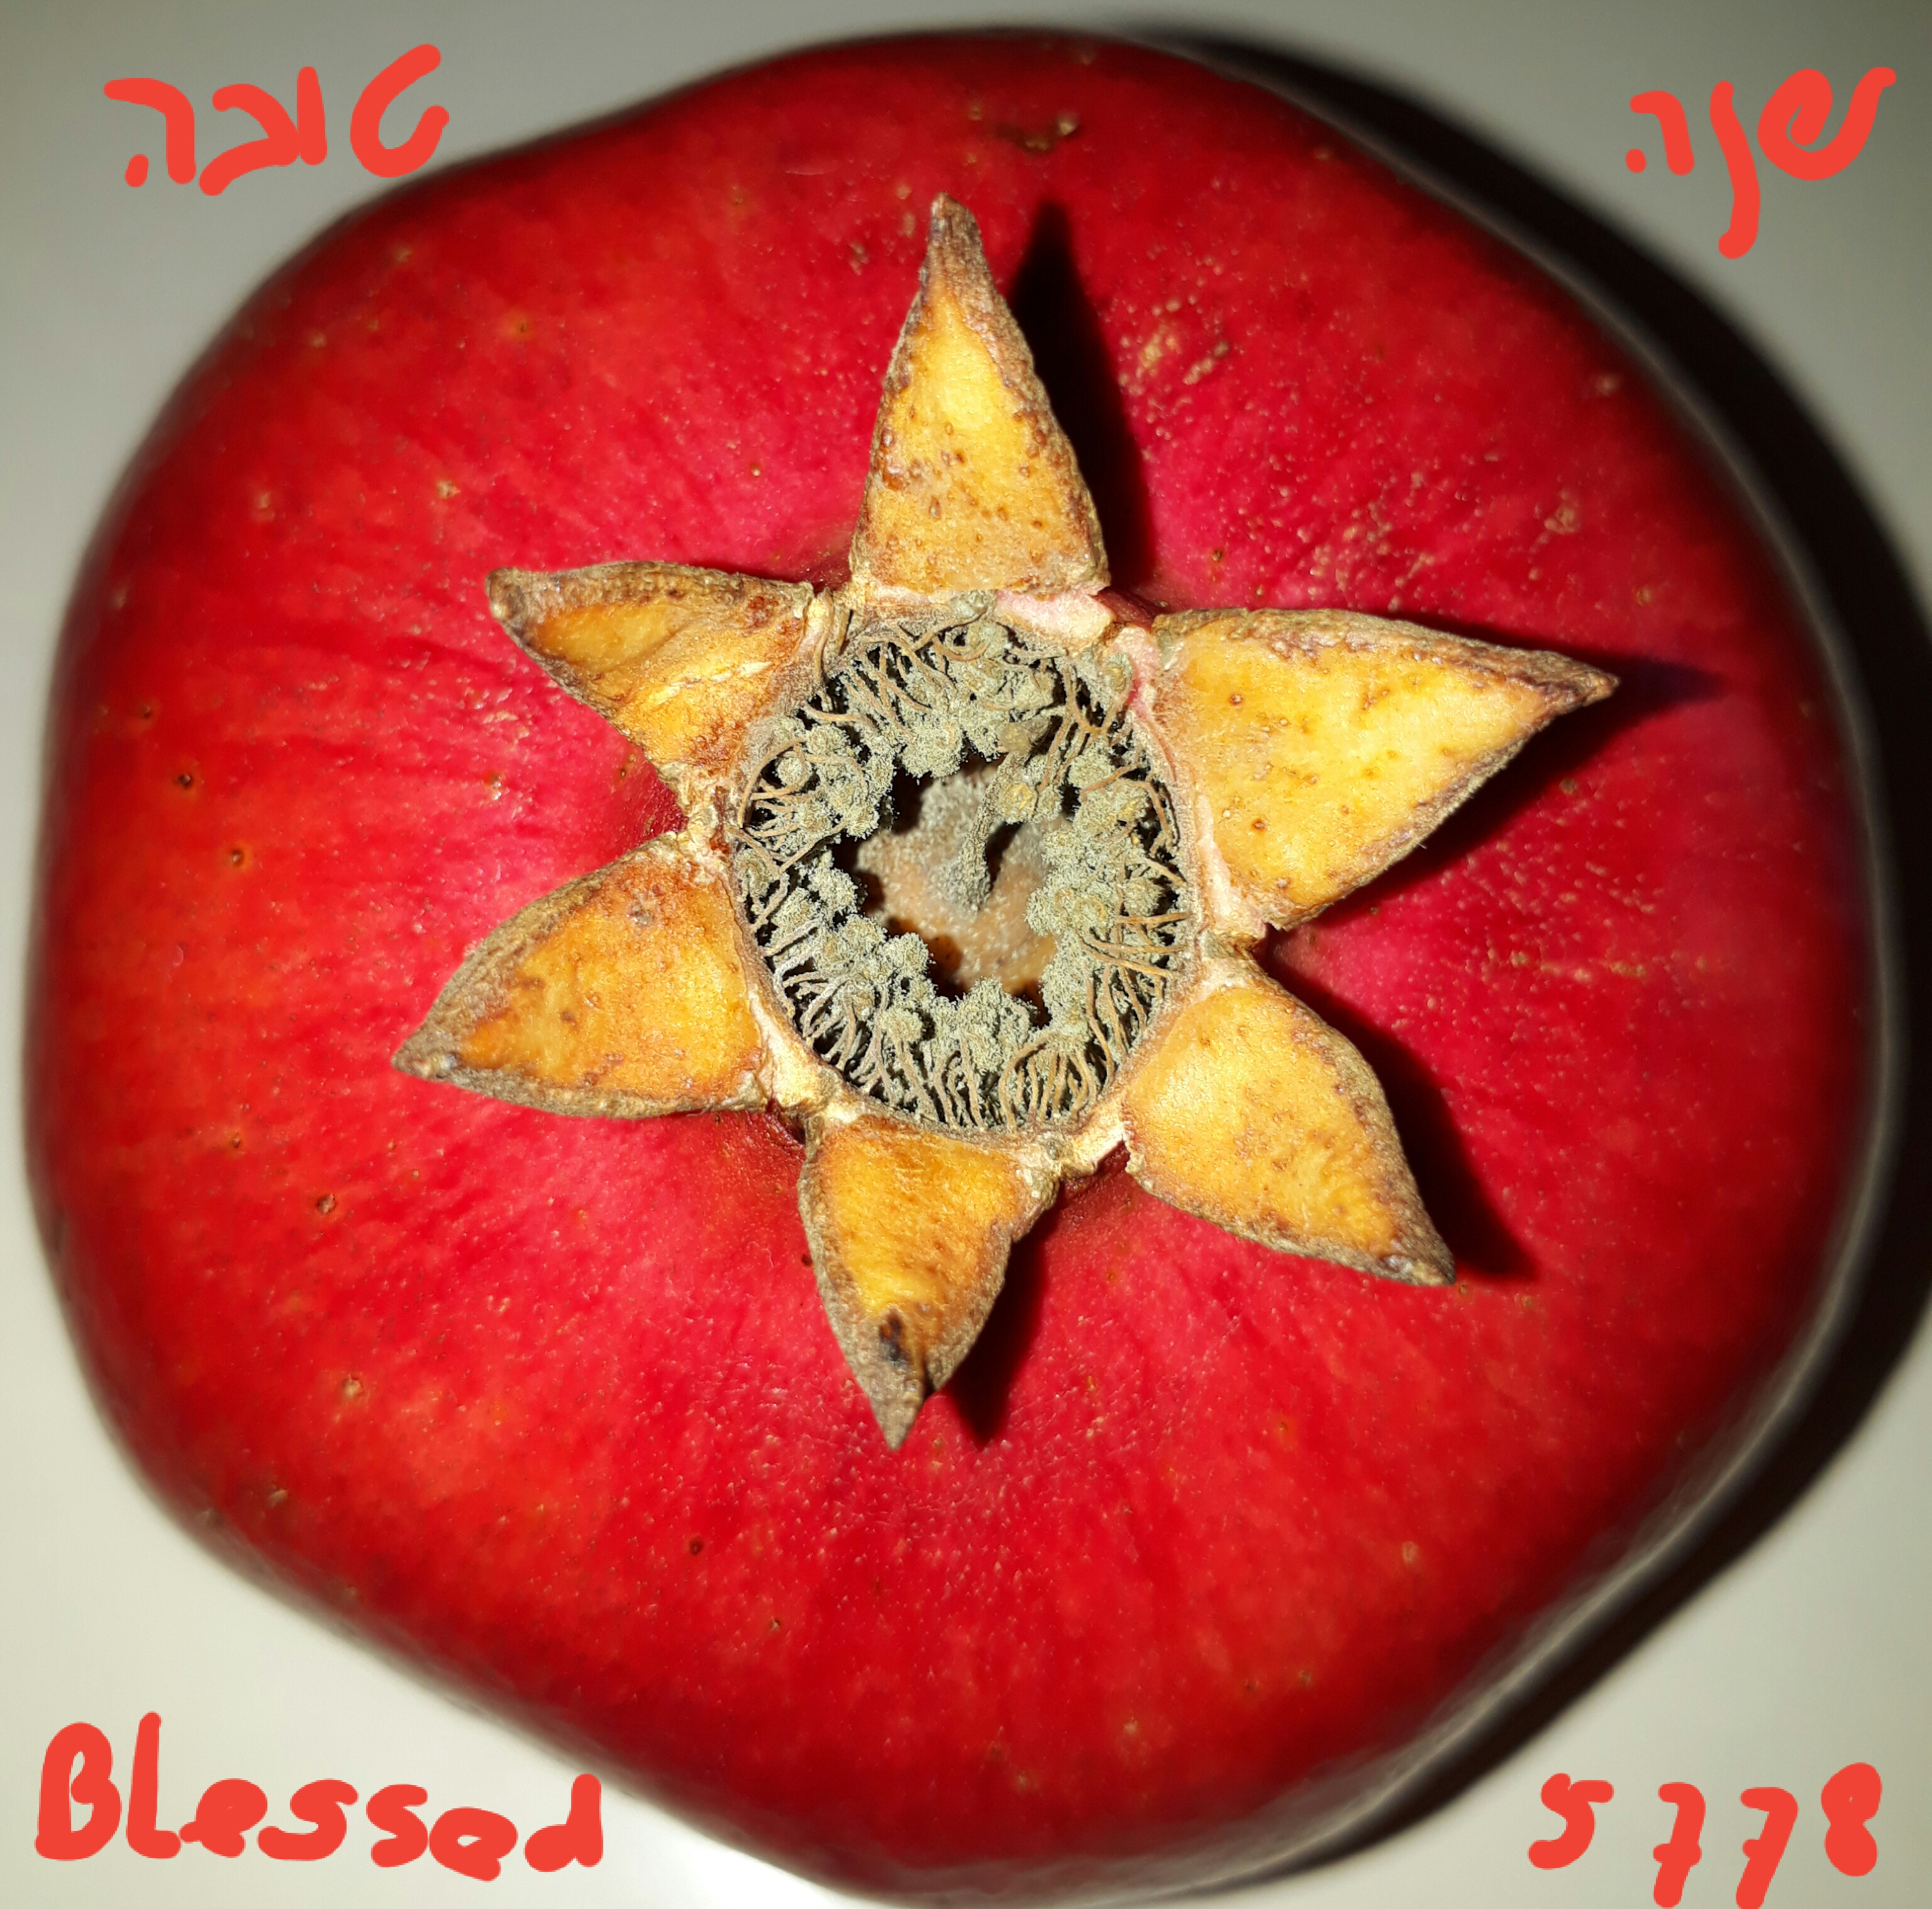 Vrucht gelukkig nieuwjaar